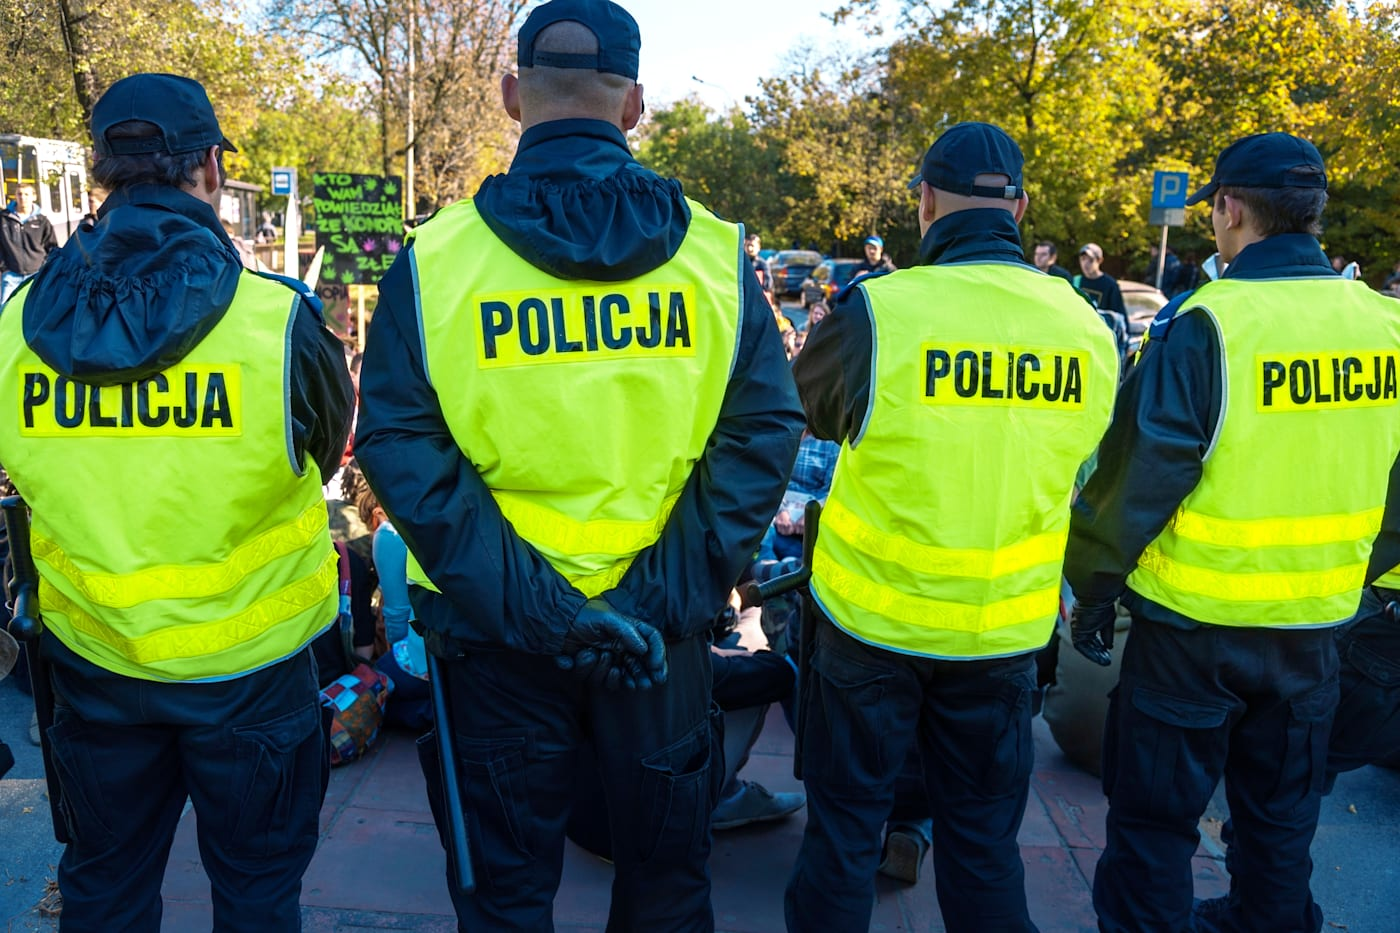 Police patrol in Wroclaw, Poland